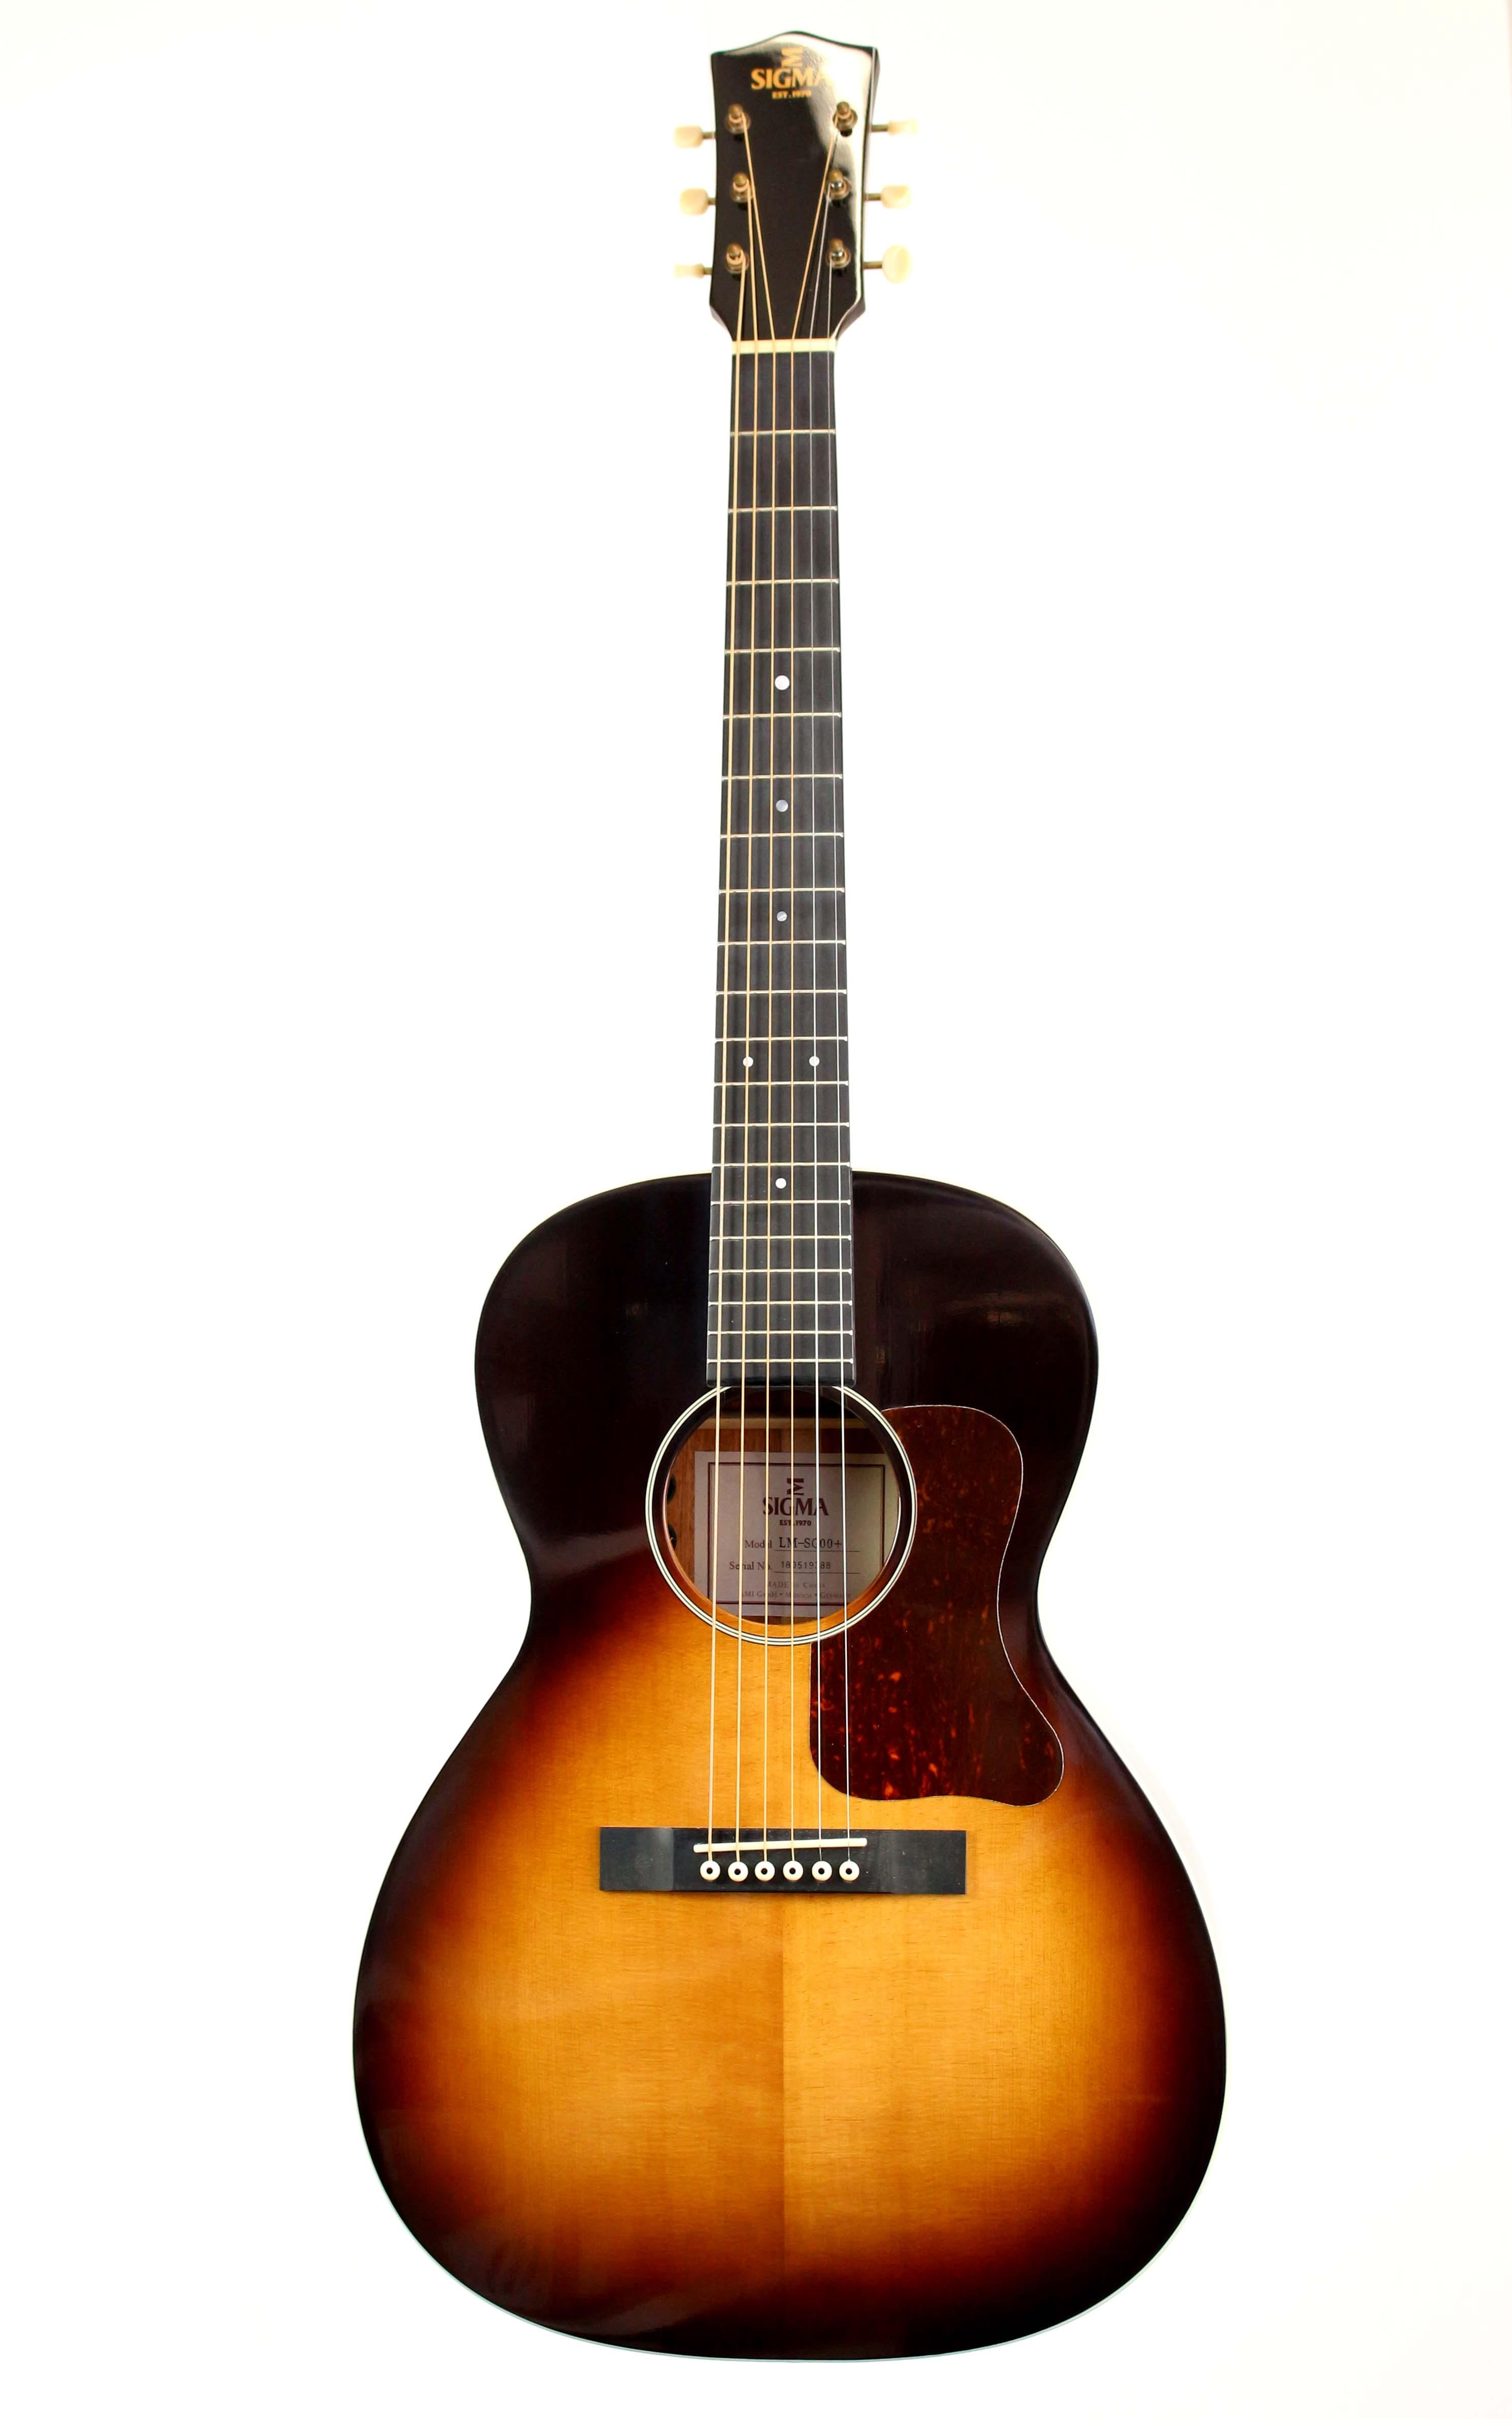 Sigma - LMSG00+ - Gitarren - Westerngitarren | MUSIK BERTRAM Deutschland Freiburg